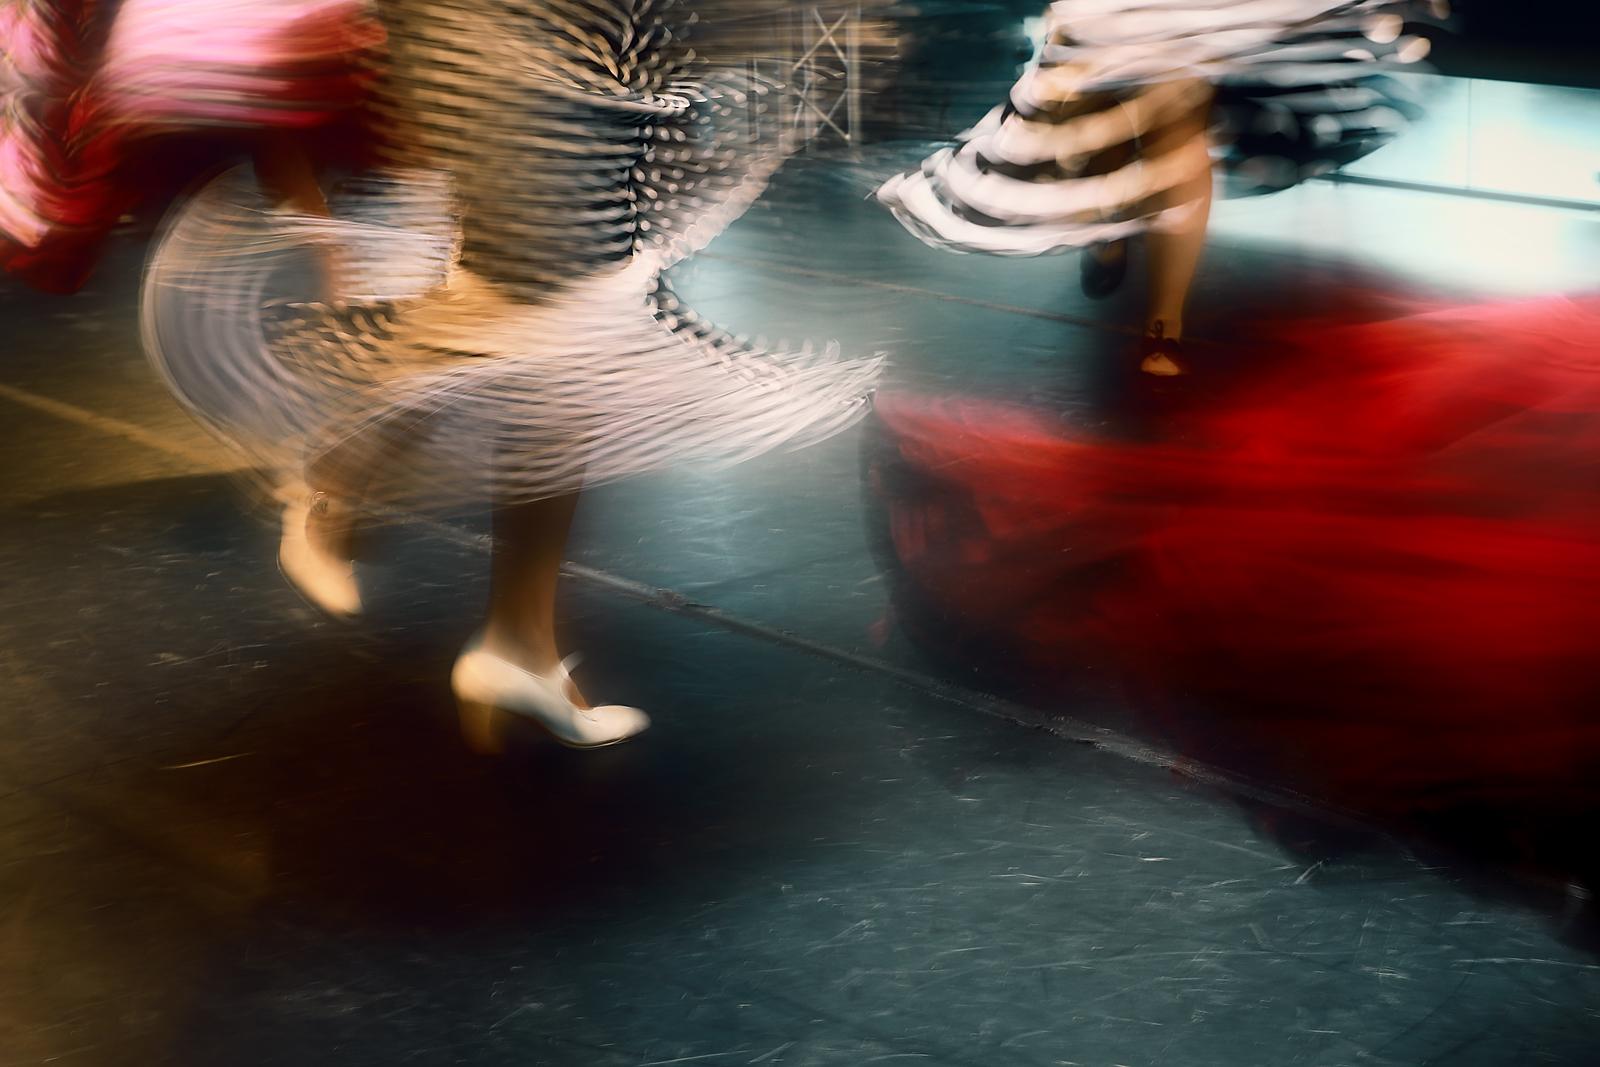 Flamenco - immaterielles Kulturerbe